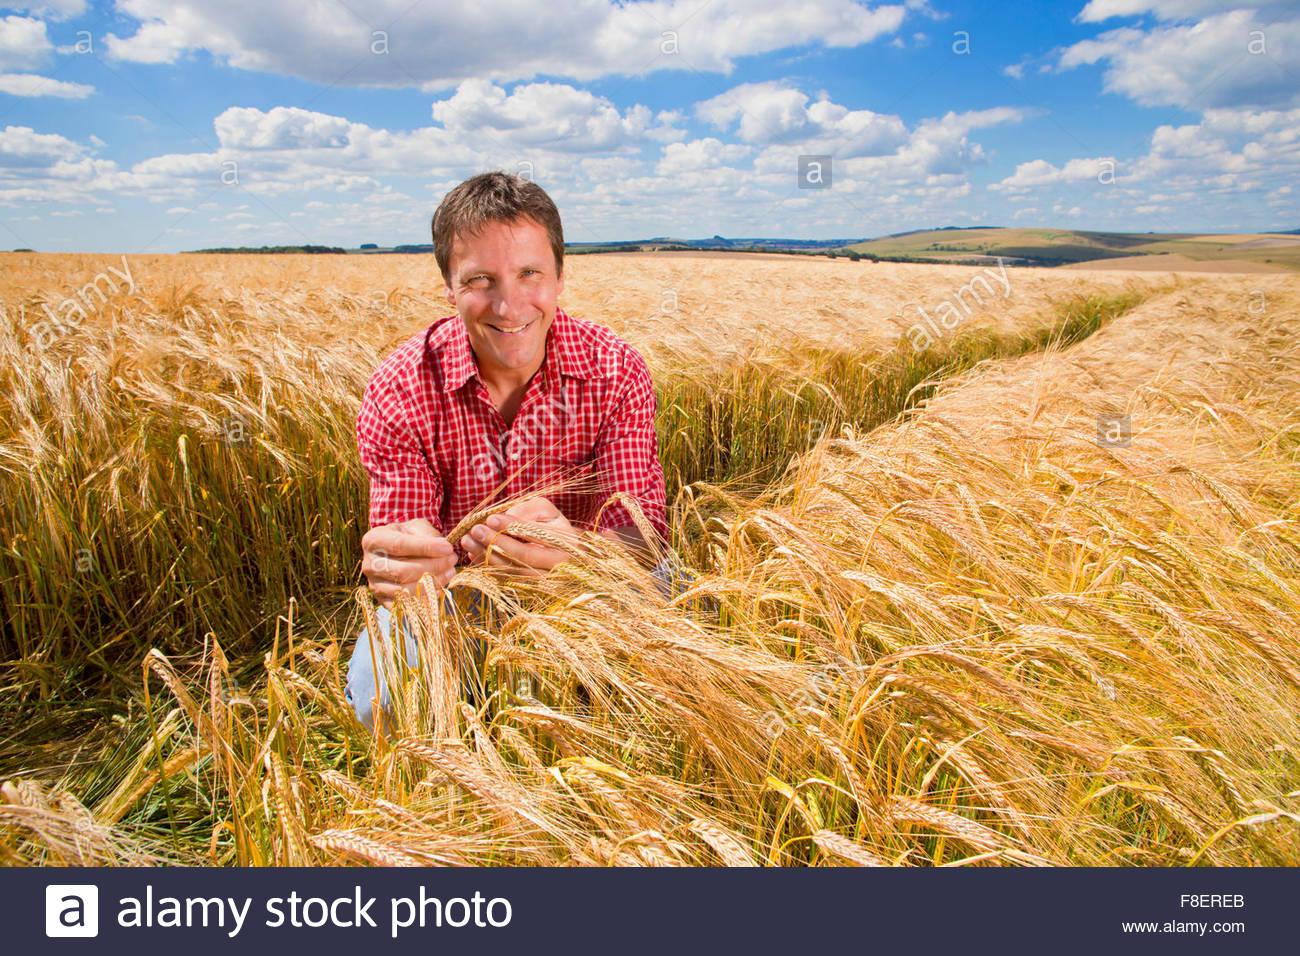 Portrait confident farmer examining sunny rural barley crop field in summer - Stock Image